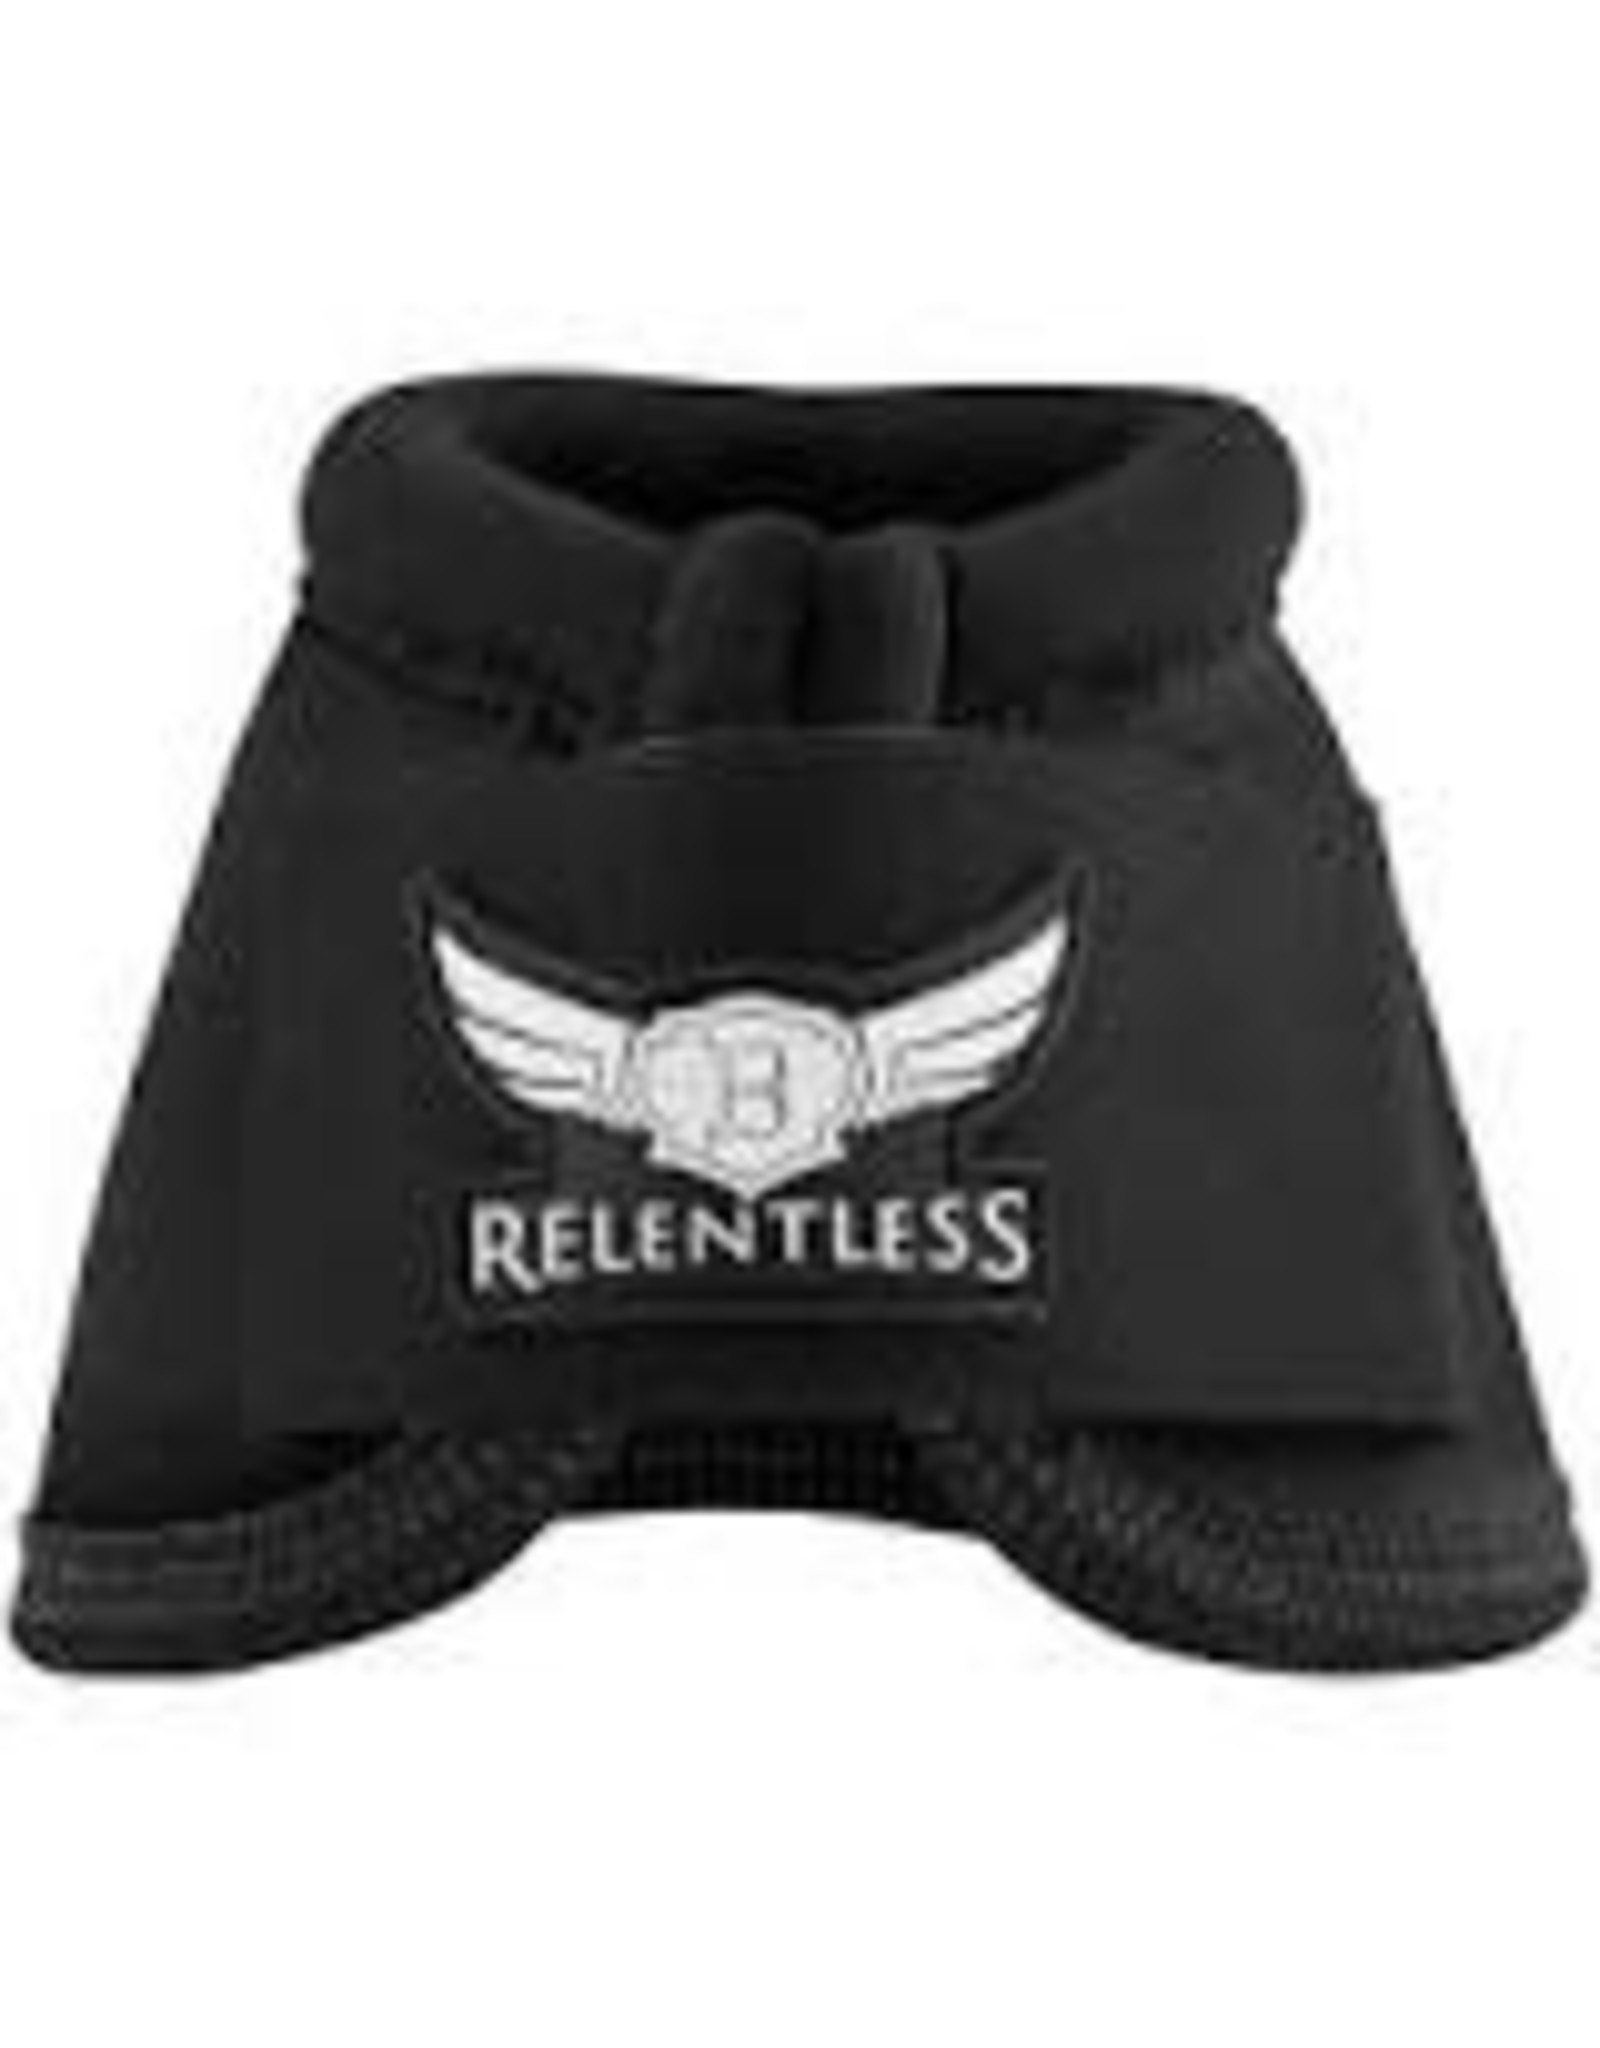 Relentless Strikeforce Bell Boot Large